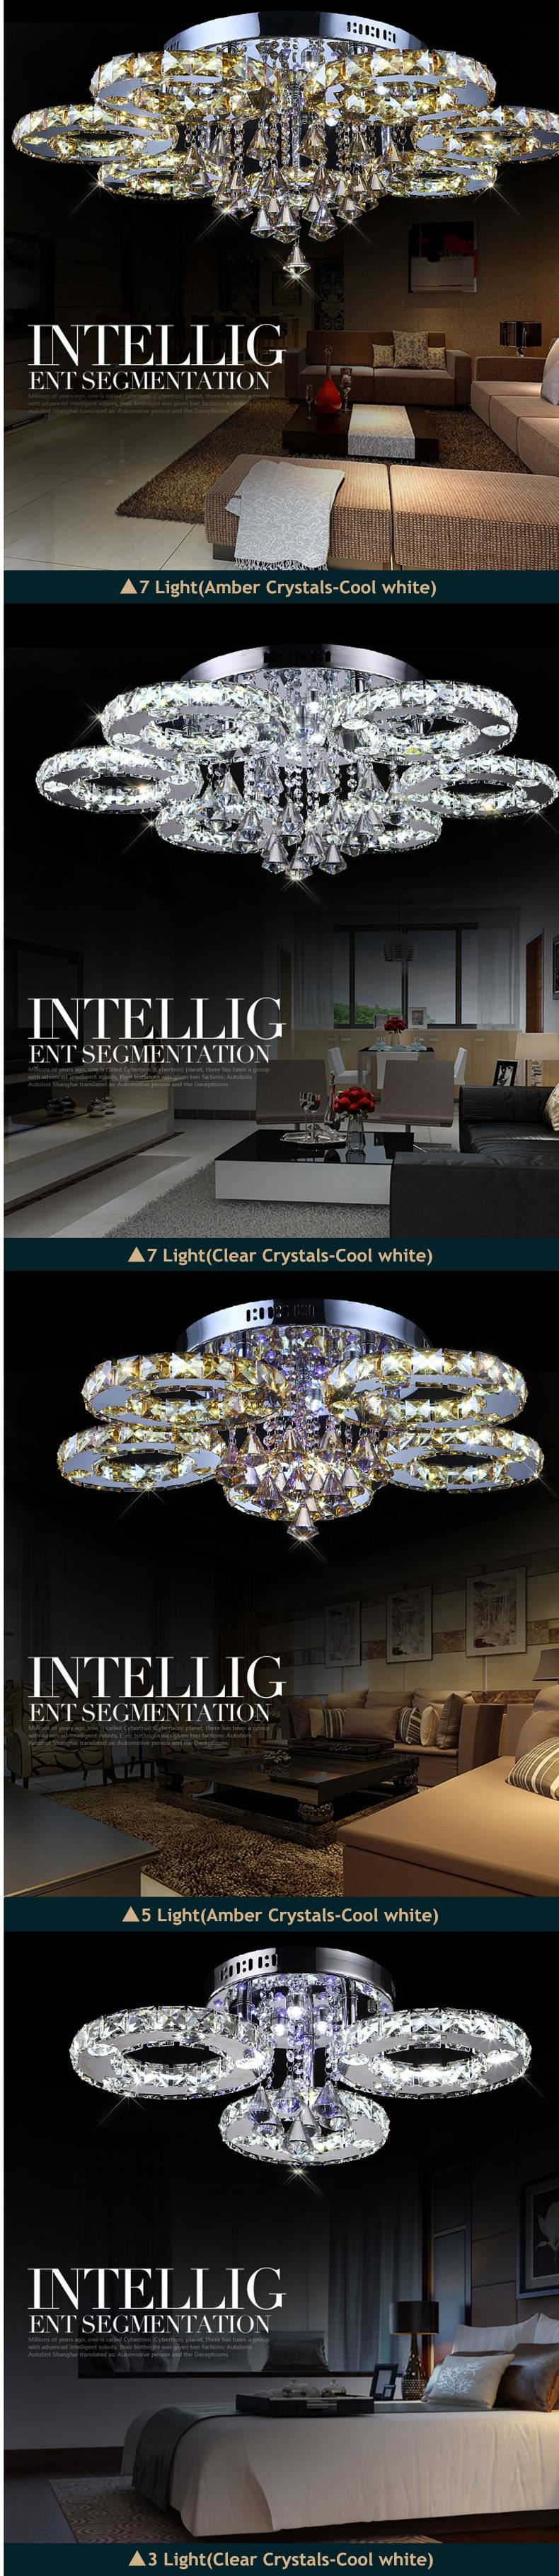 H101e470de8b7442d93df627deae70c66j Flush Crystal Ceiling Lights | Crystal Flush Mount Ceiling Light | Modern Led Crystal Ceiling Lights For Living Room and For Home Decoration with Voltage 85-265V